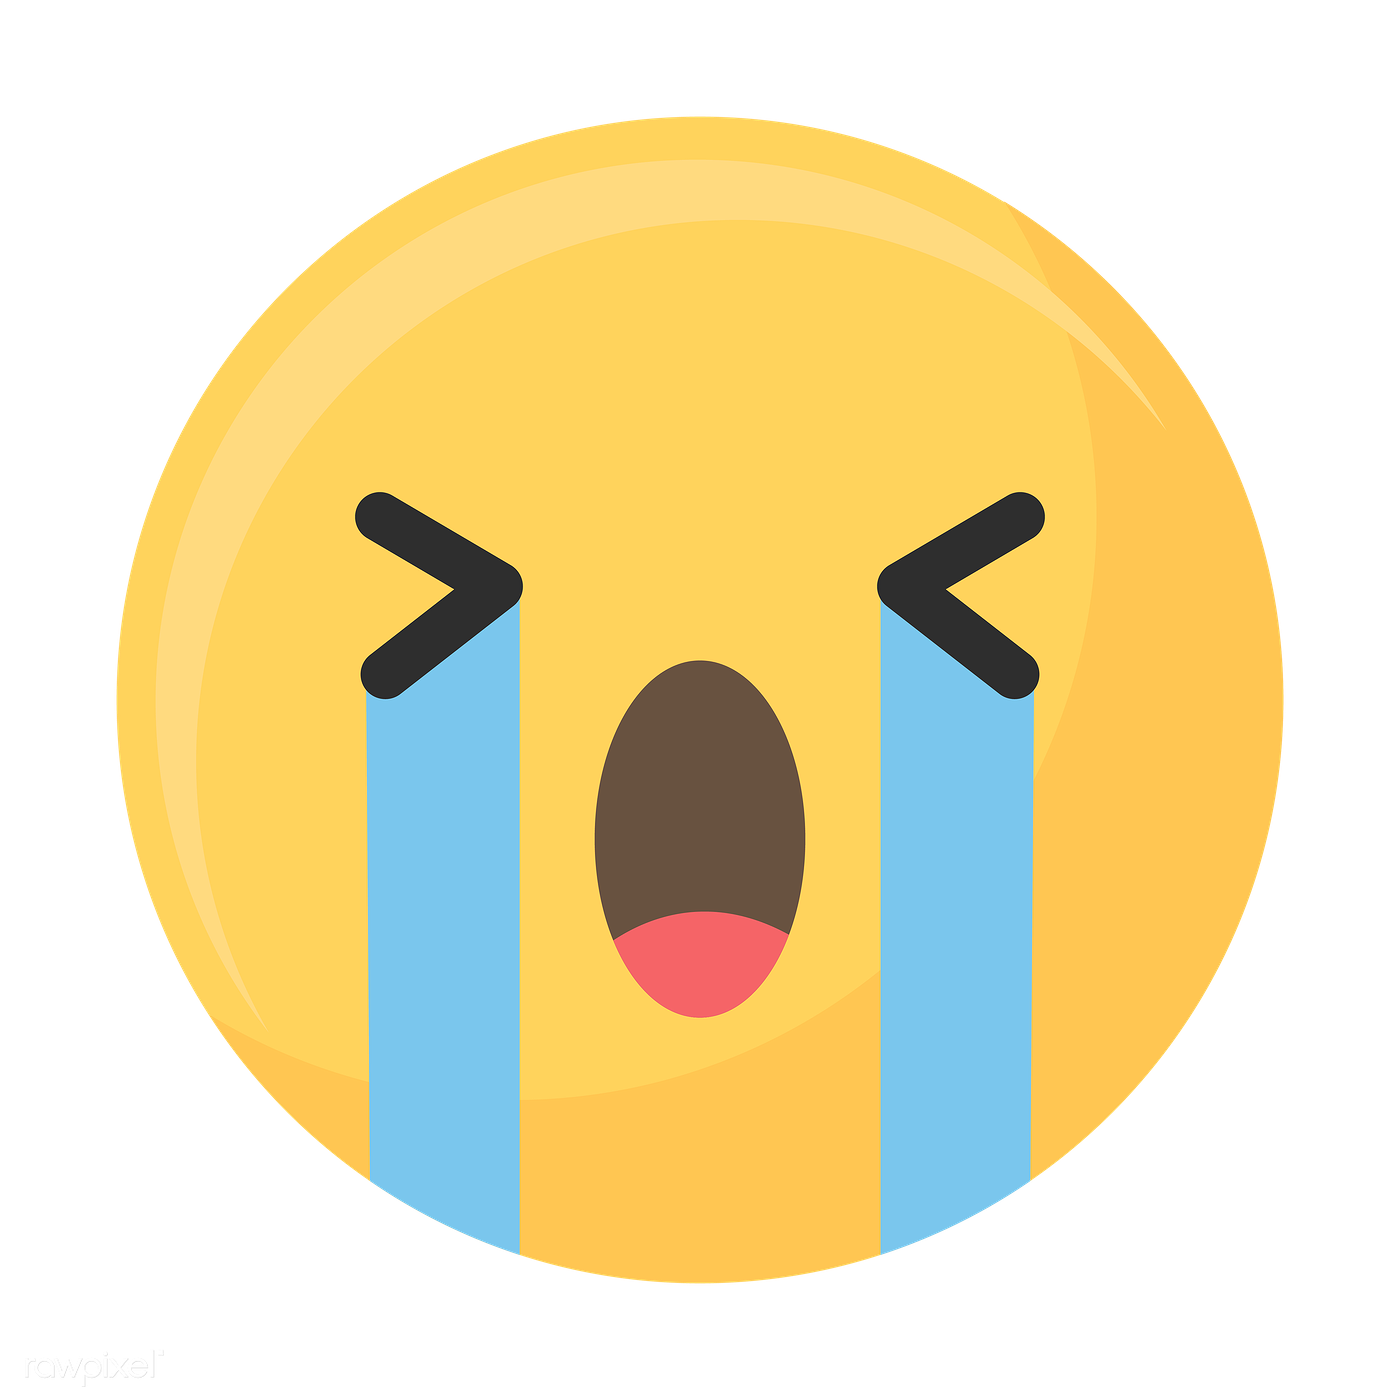 Sad face emoji icon | Royalty free stock transparent png ...